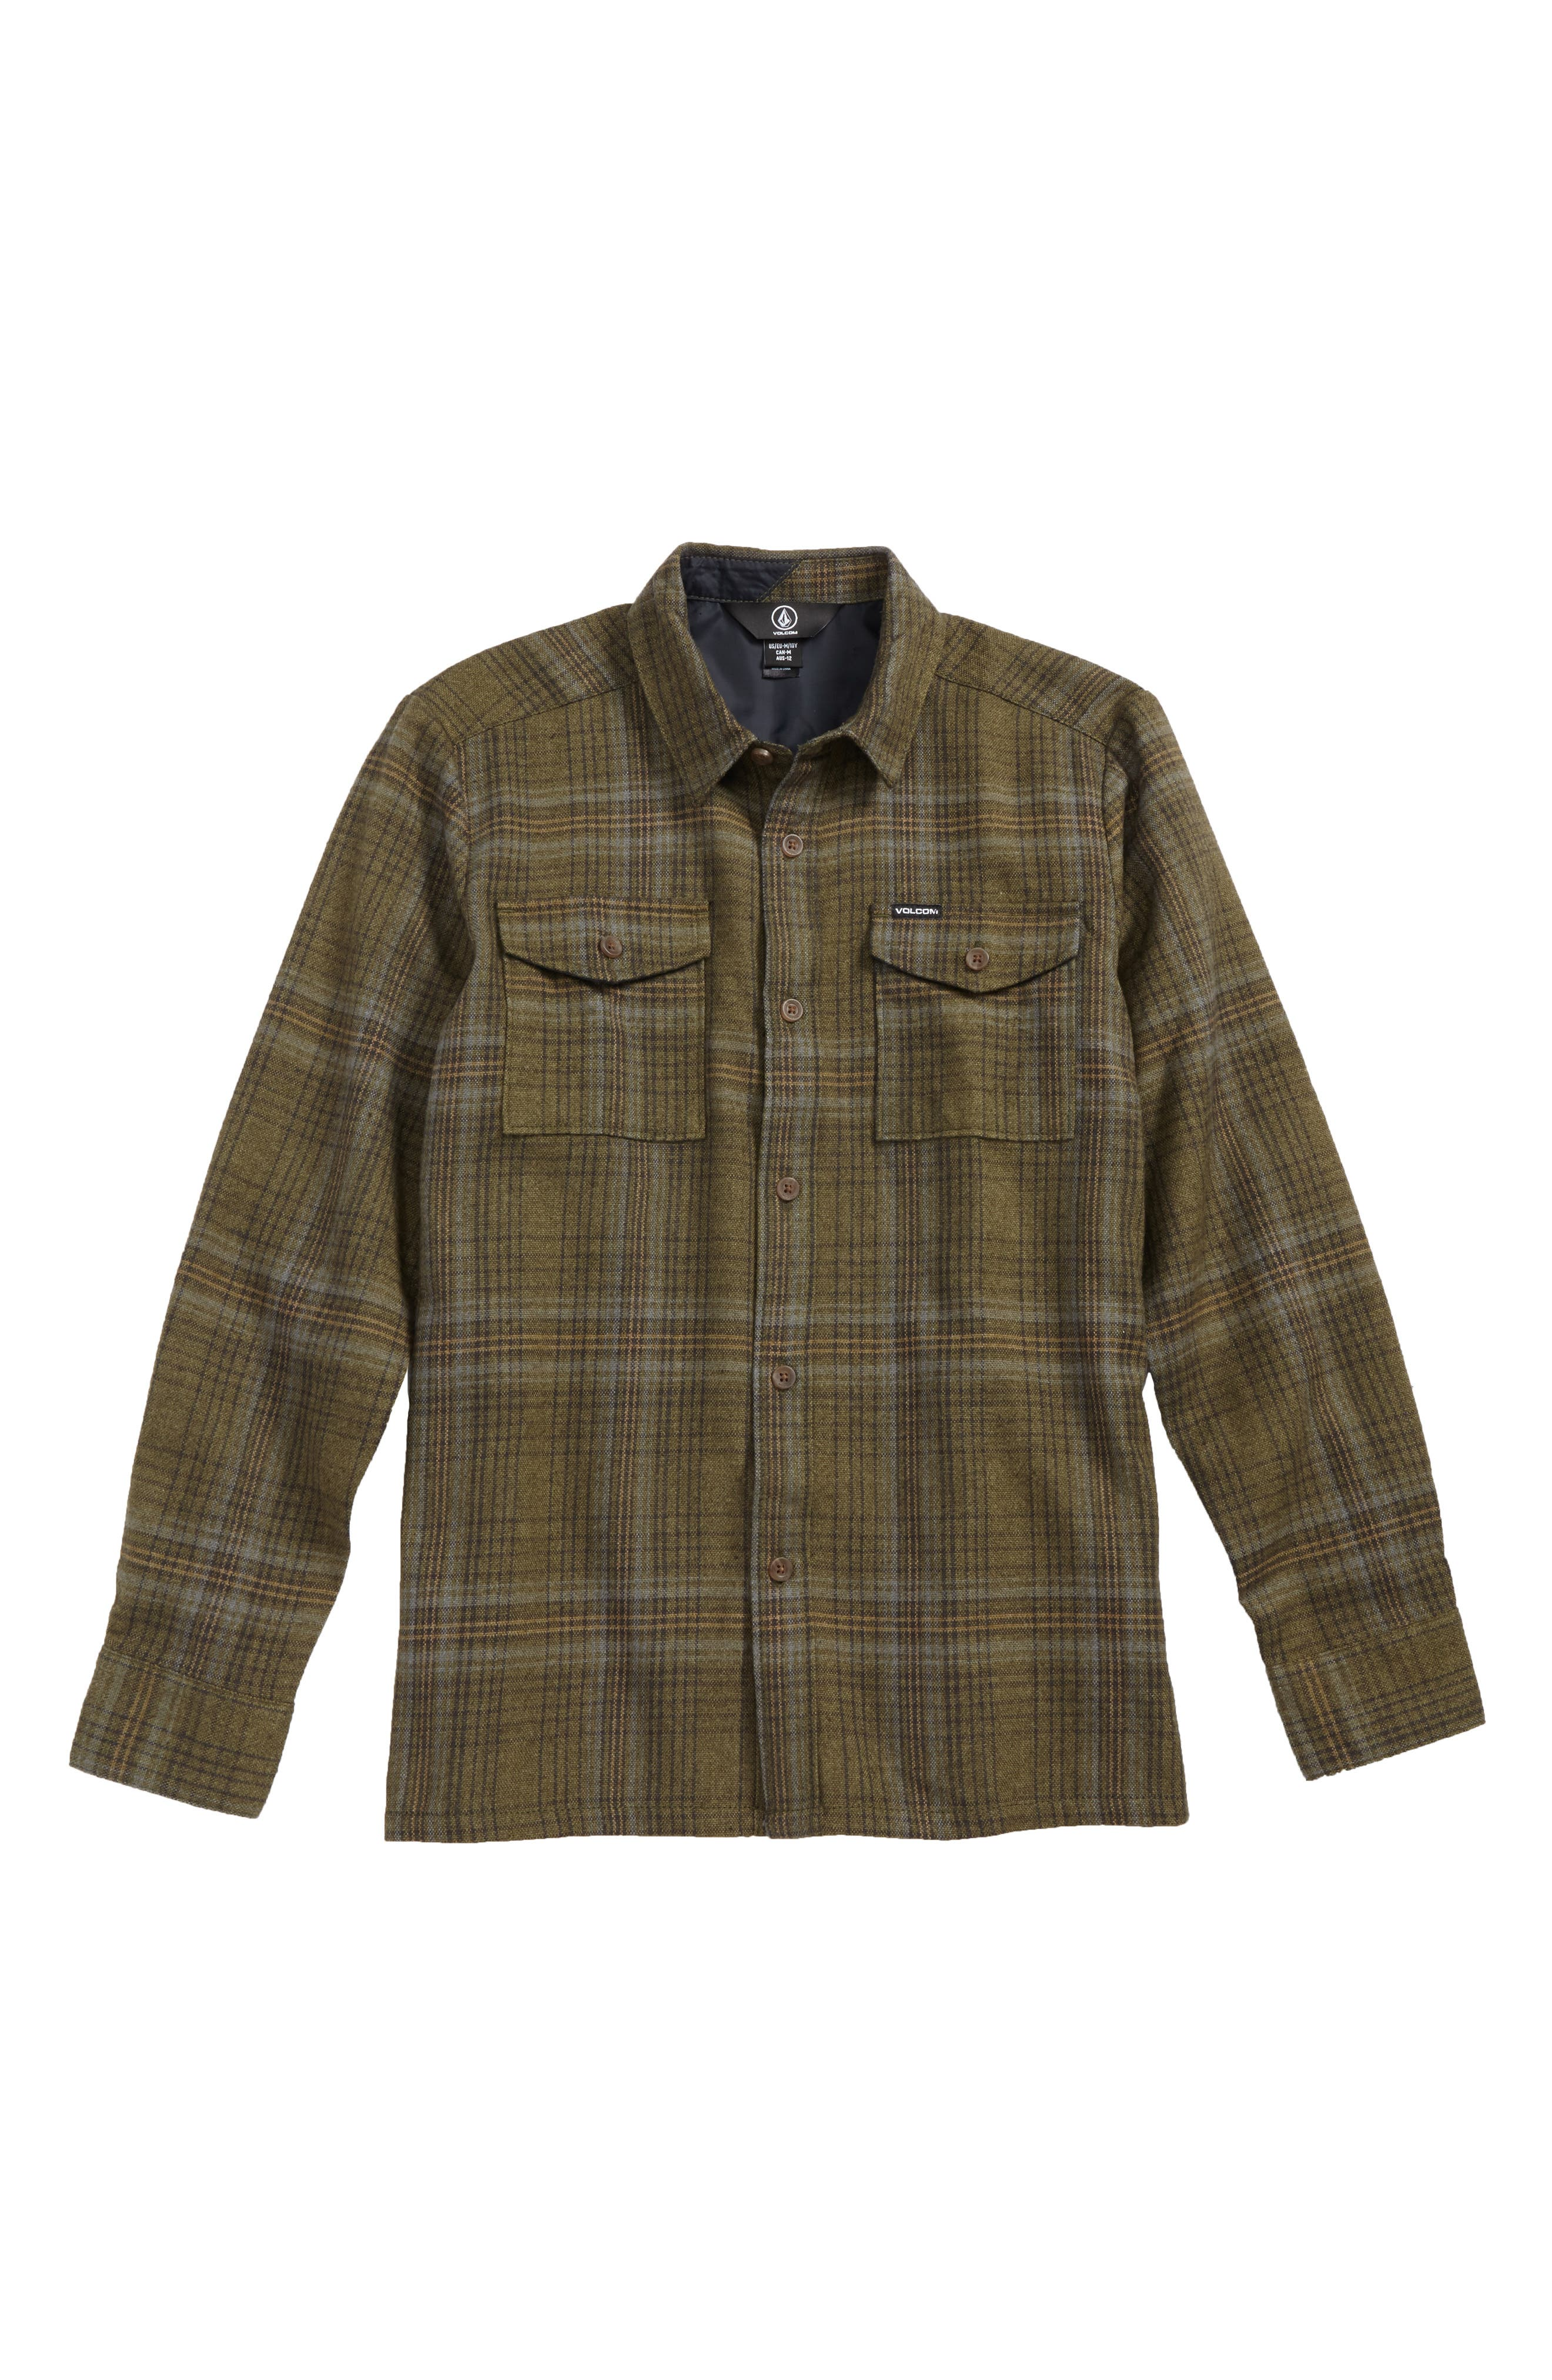 Alternate Image 1 Selected - Volcom Bodhi Plaid Flannel (Big Boys)